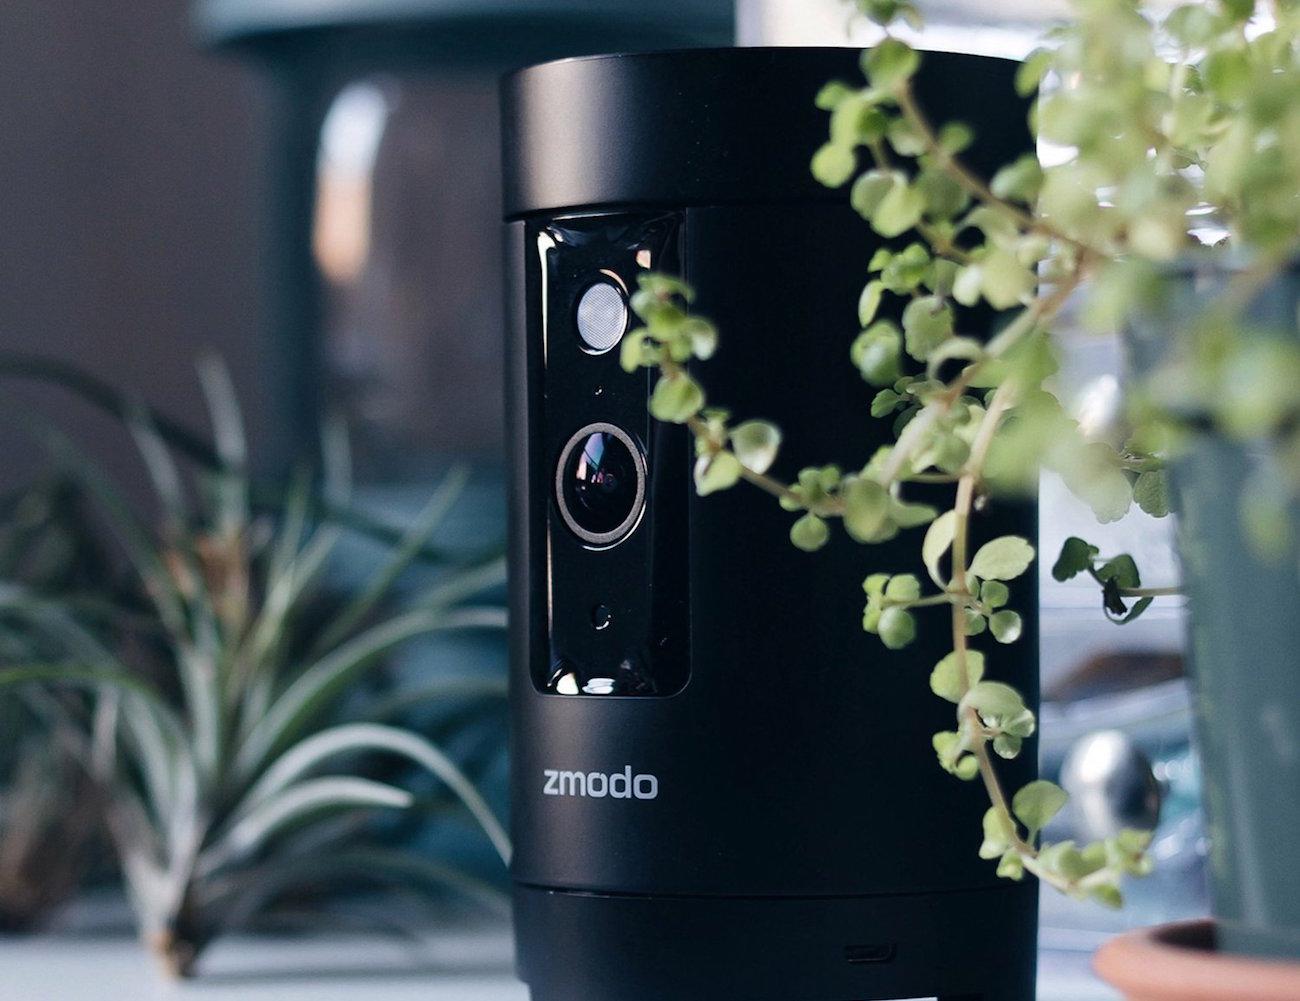 Zmodo Pivot 360 Robotic Camera & Smart Hub